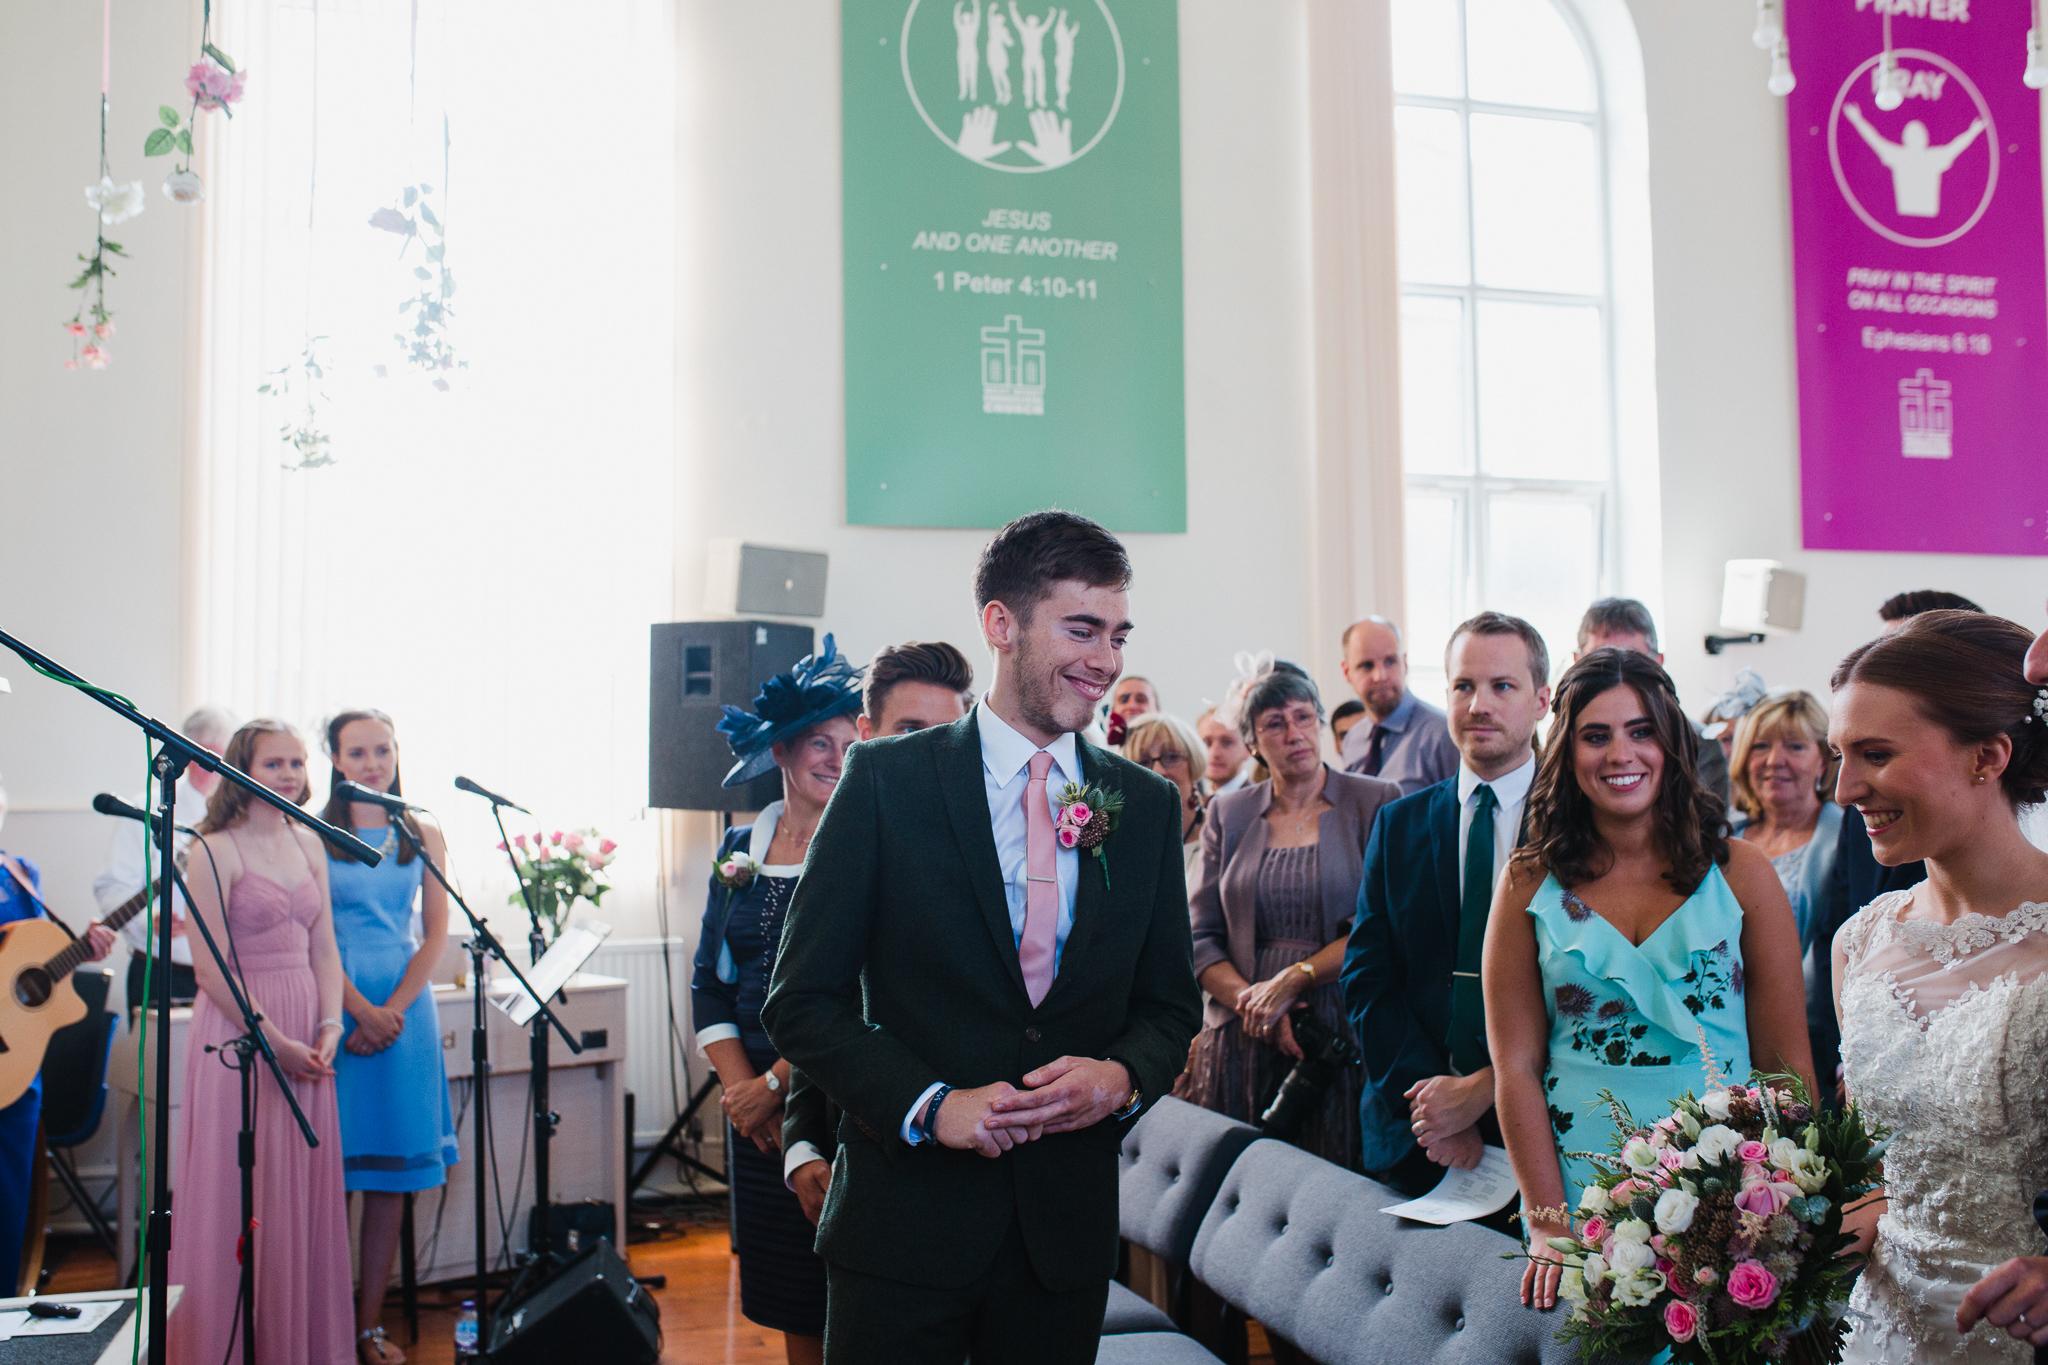 Jess and Ben - Liverpool wedding - ben waiting for his bride